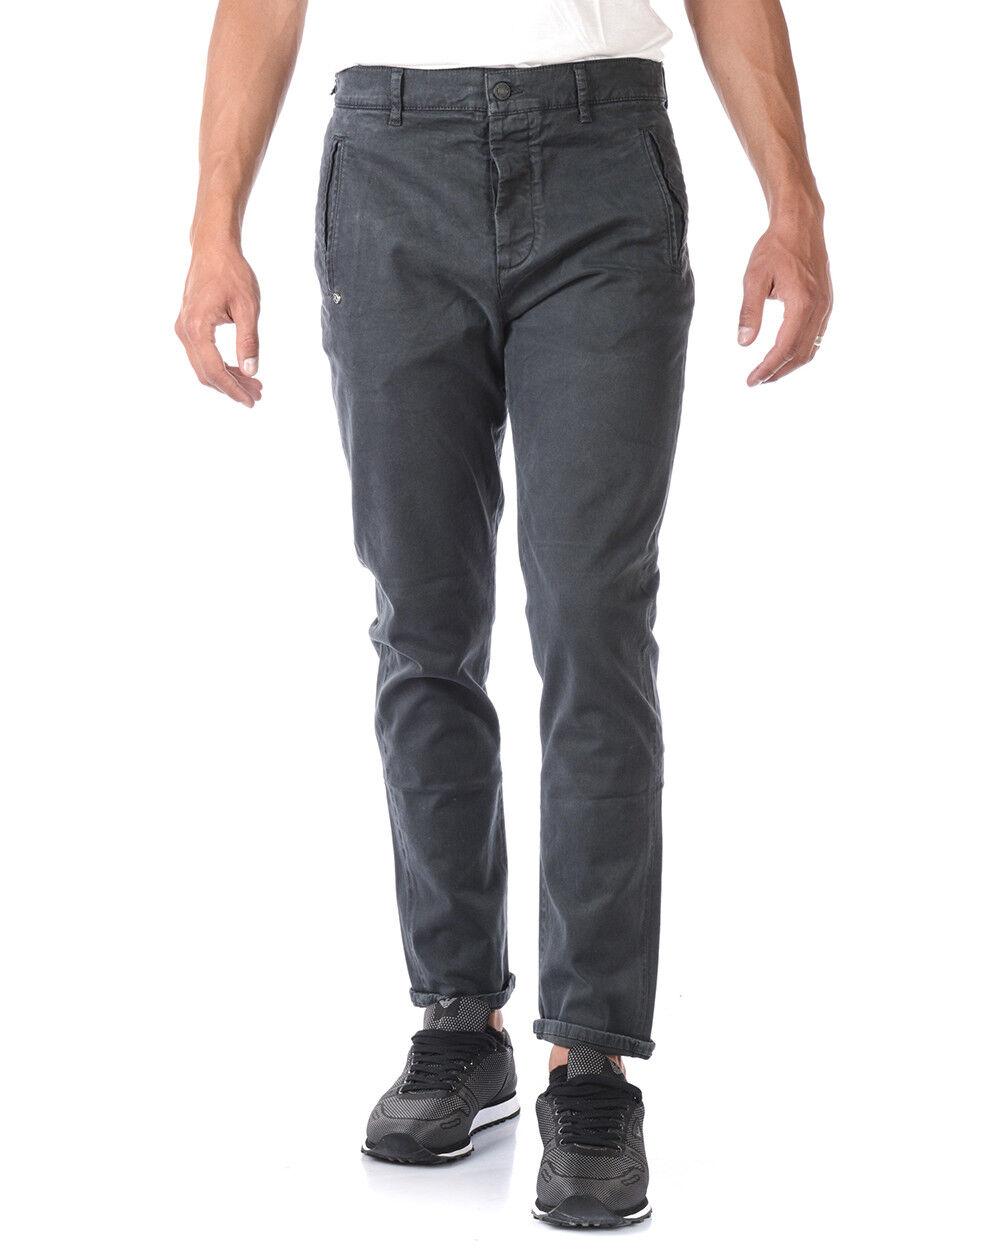 Jeans Daniele Alessandrini Jeans Cotone men grey PJ5650L1003706 10